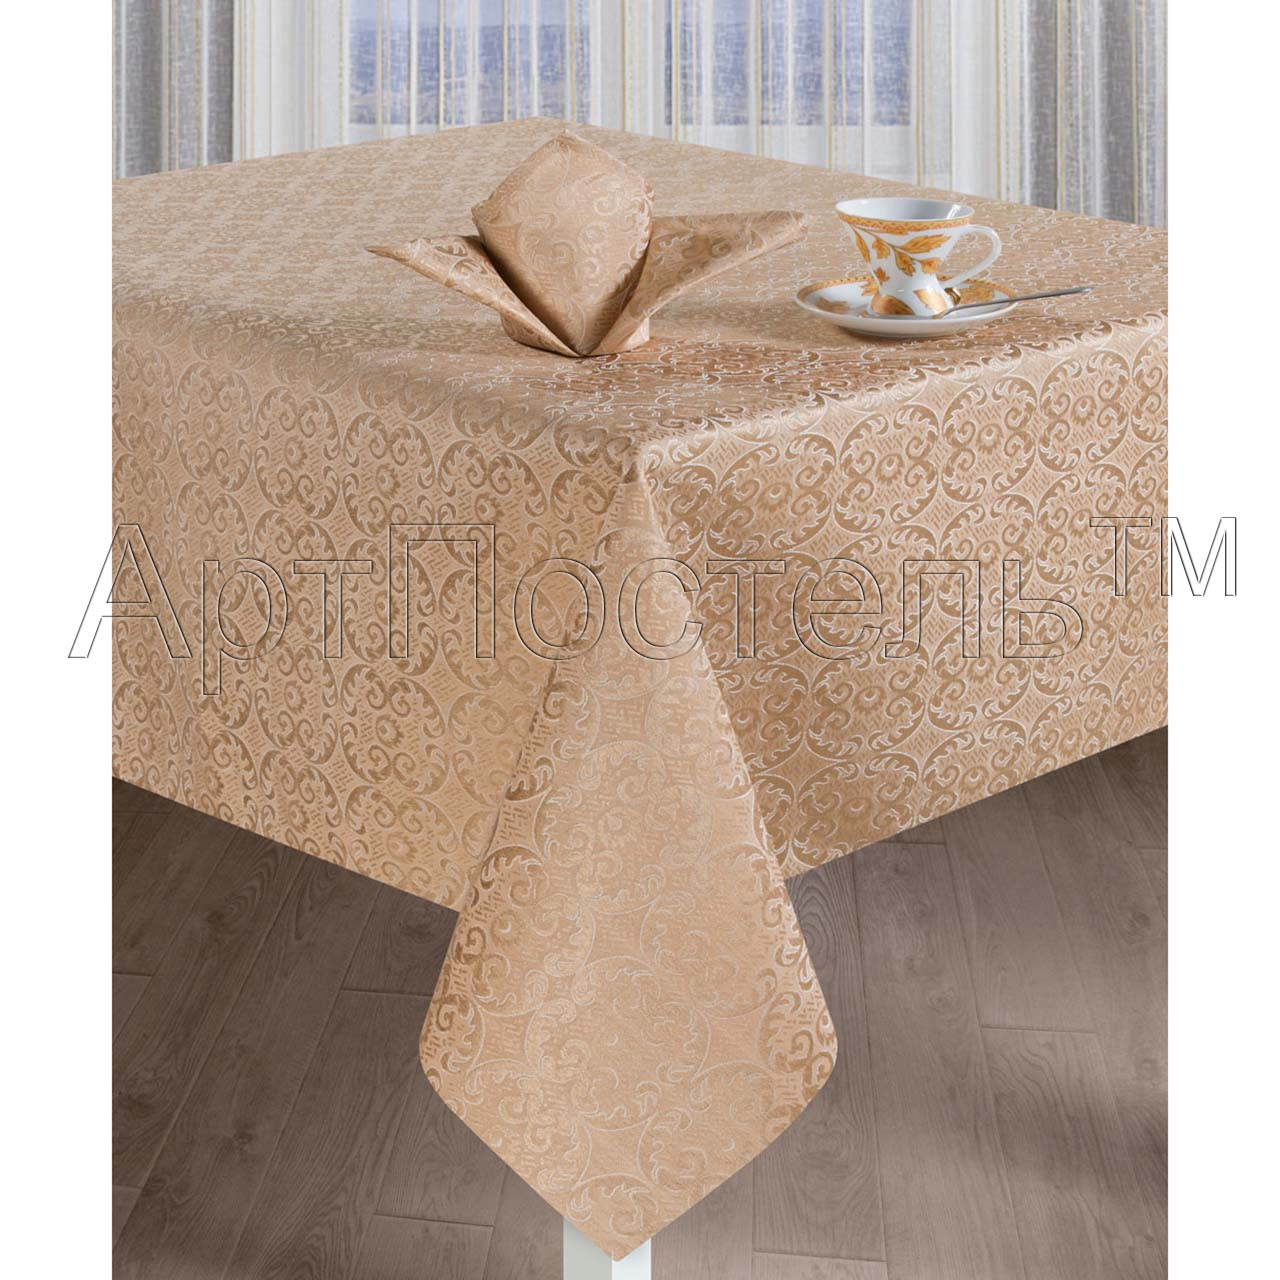 Кухонные принадлежности Марго Капучино р. 260х150Скатерти<br>Скатерть: 260х150 см - 1 шт. <br>Салфетка: 40х40 см - 6 шт.<br><br>Тип: Кухонные принадлежности<br>Размер: 260х150<br>Материал: Жаккард